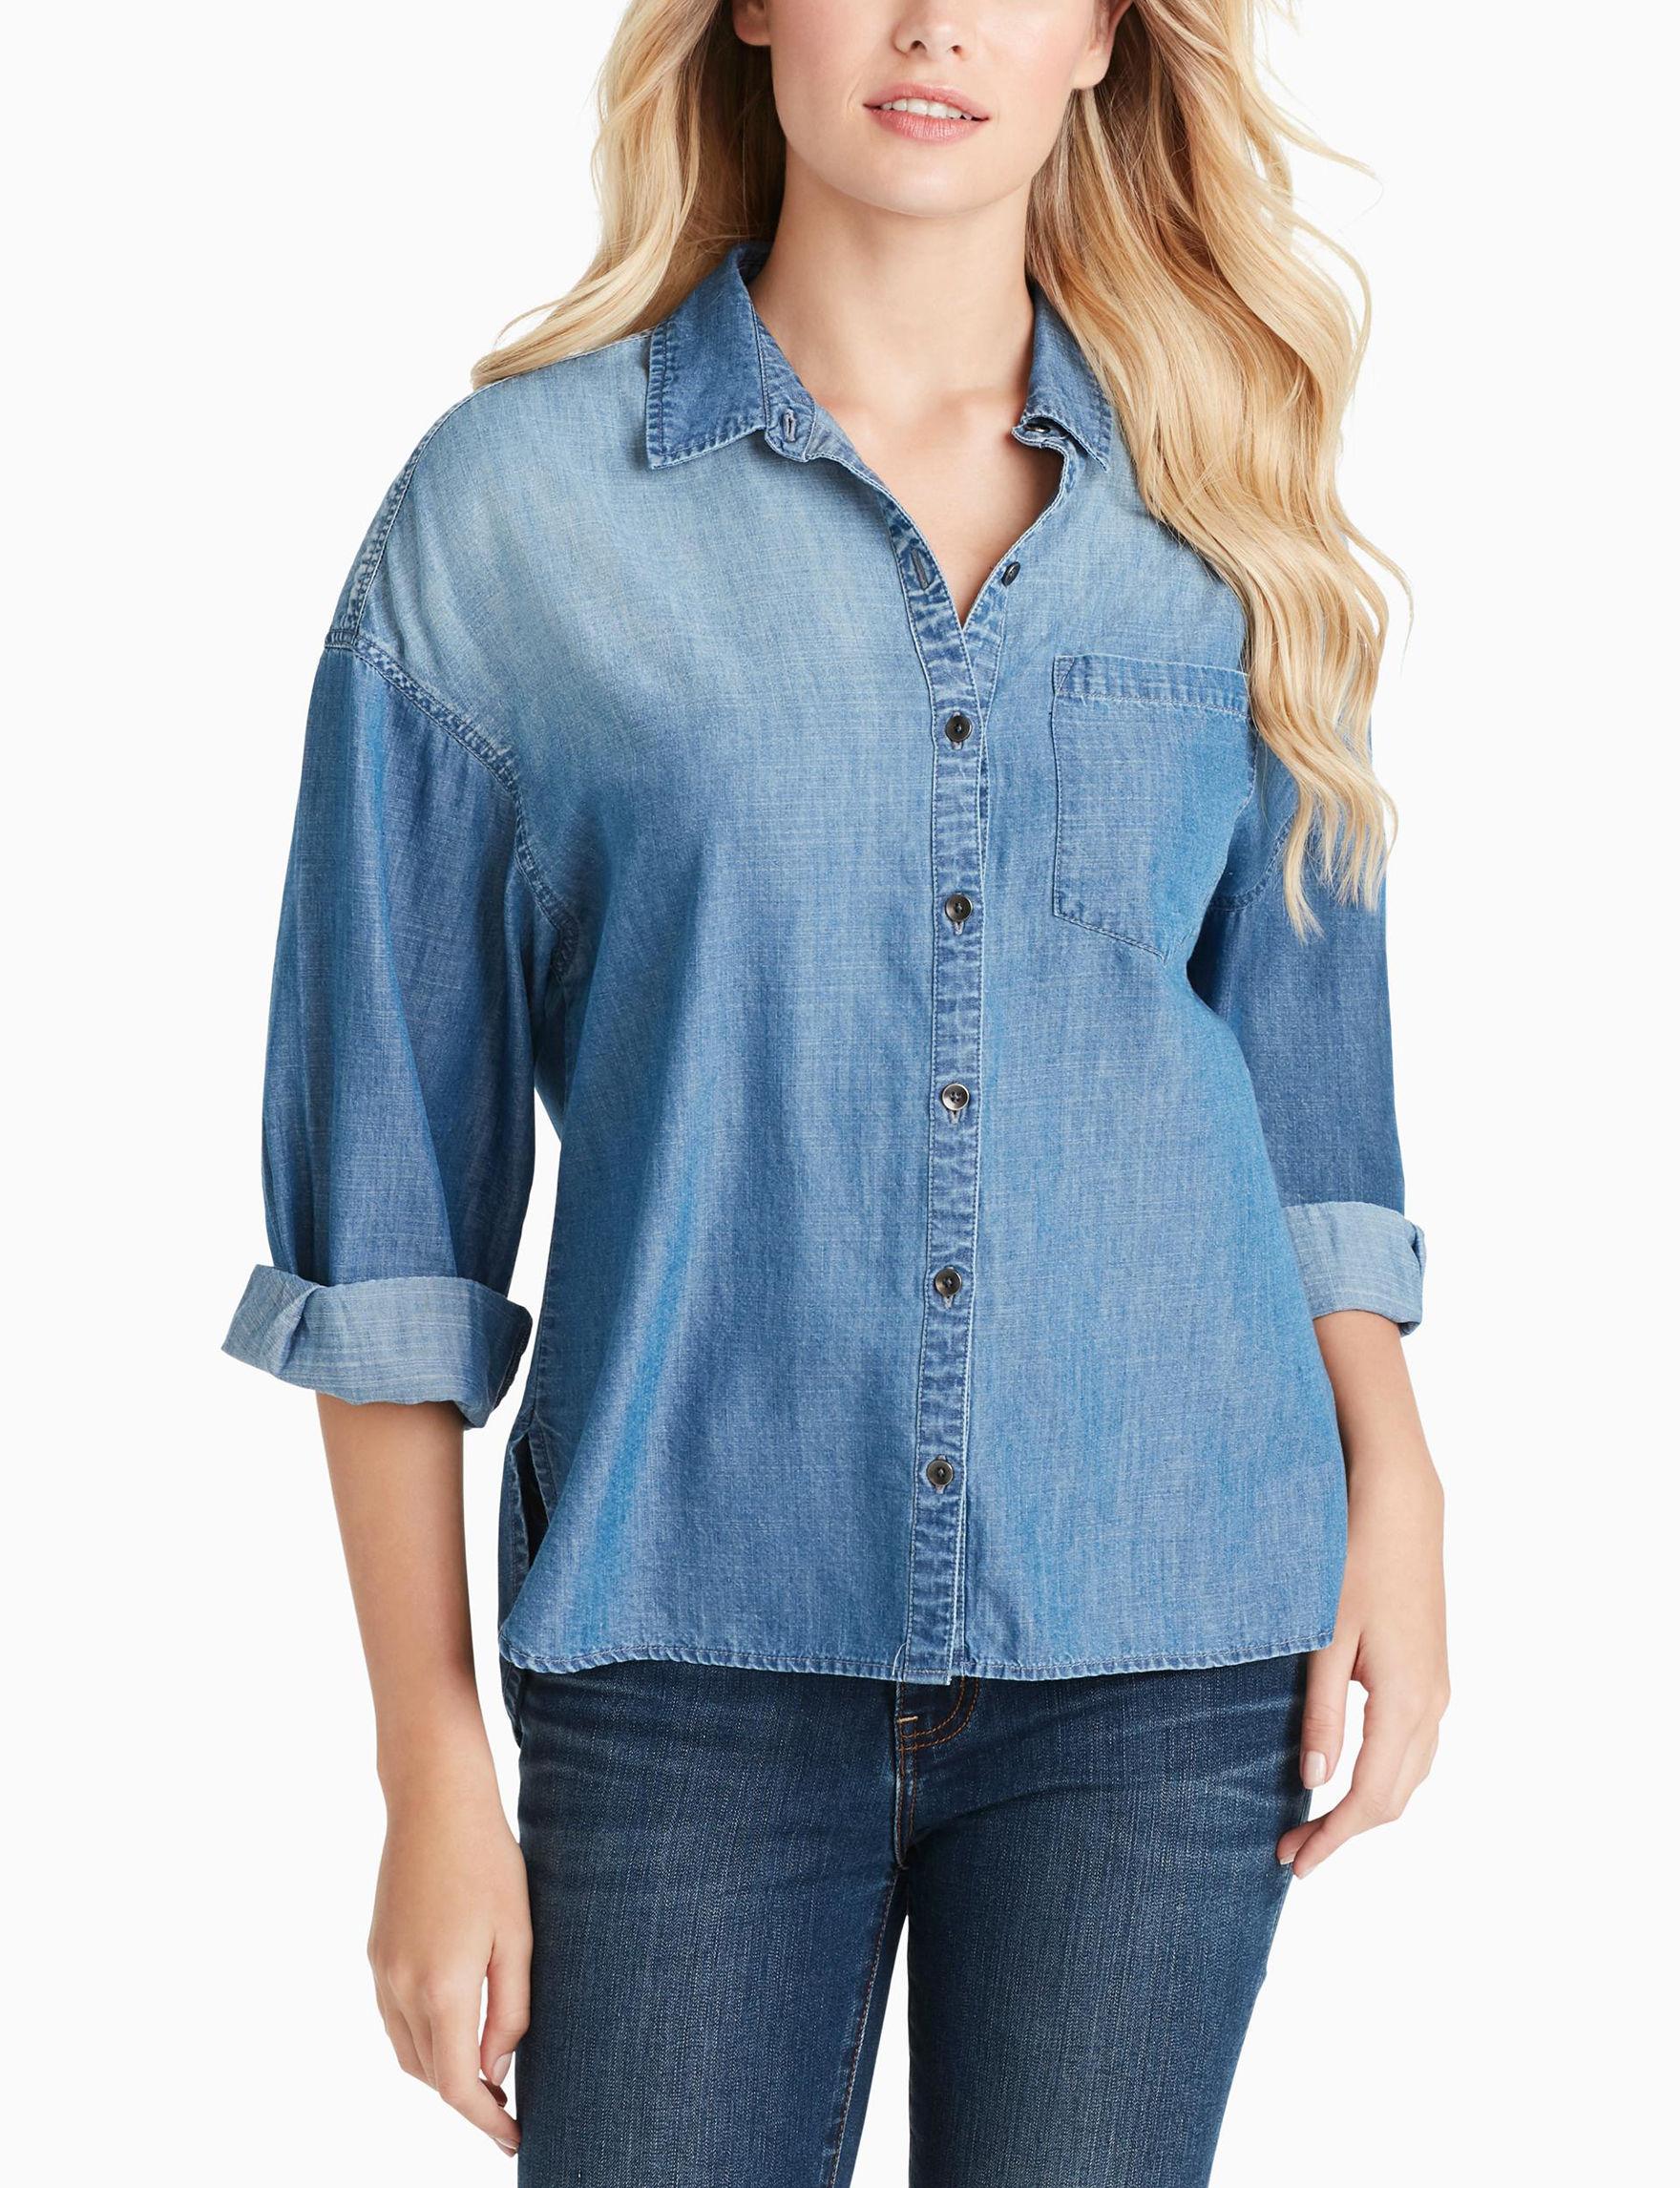 Jessica Simpson Denim / Blue Shirts & Blouses